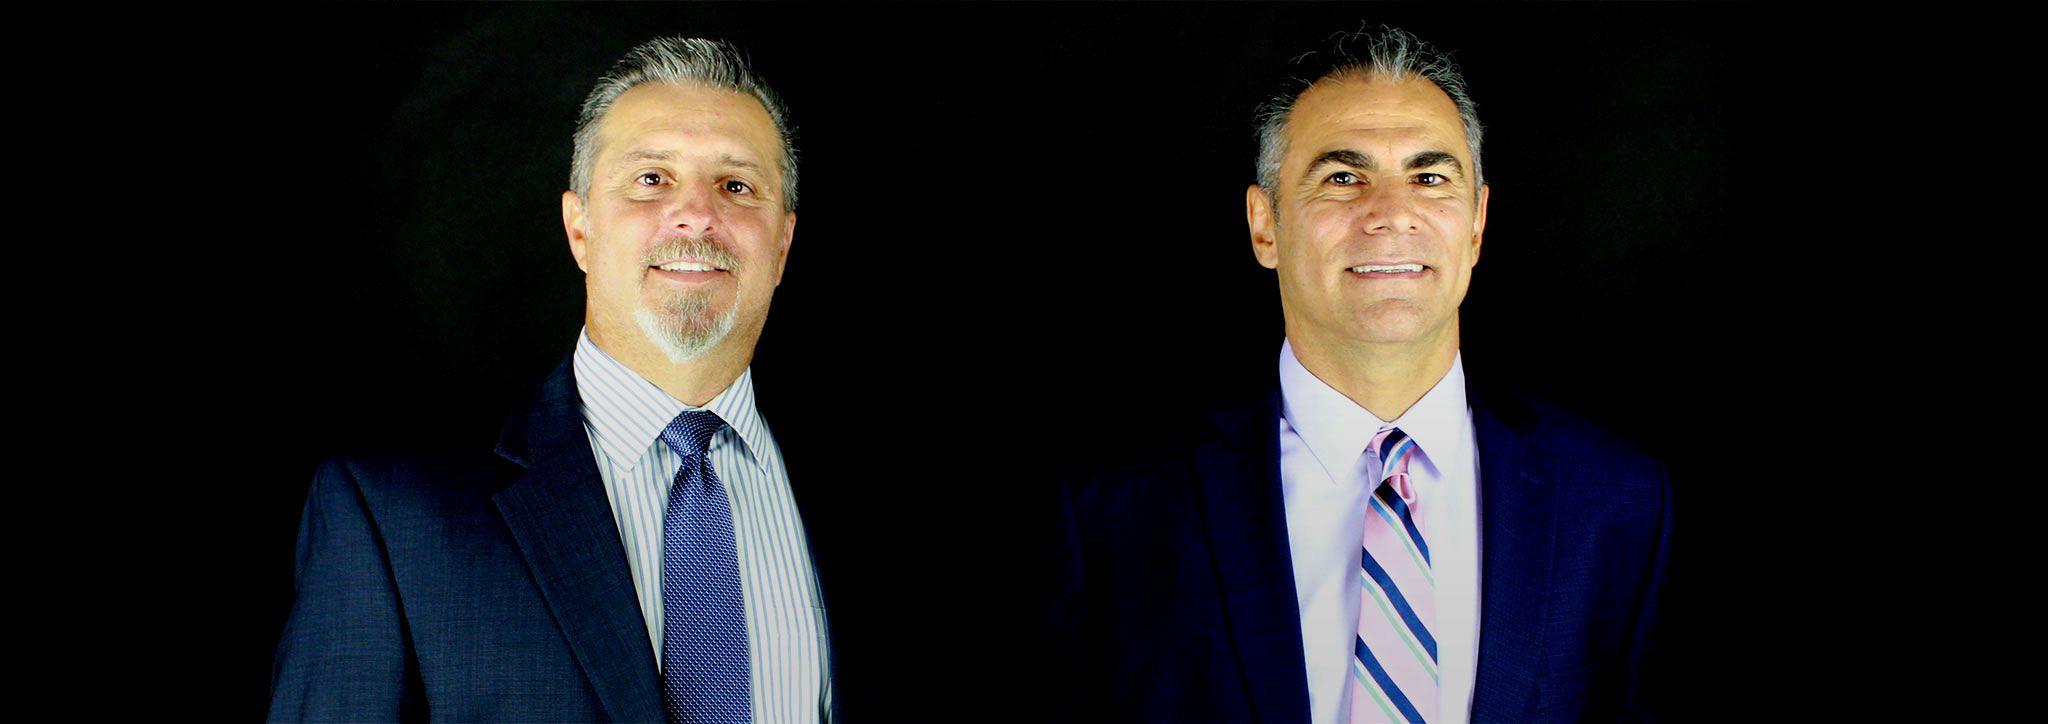 Gazda Tadayon Las Vegas Personal Injury Attorneys 2020 Fotograf